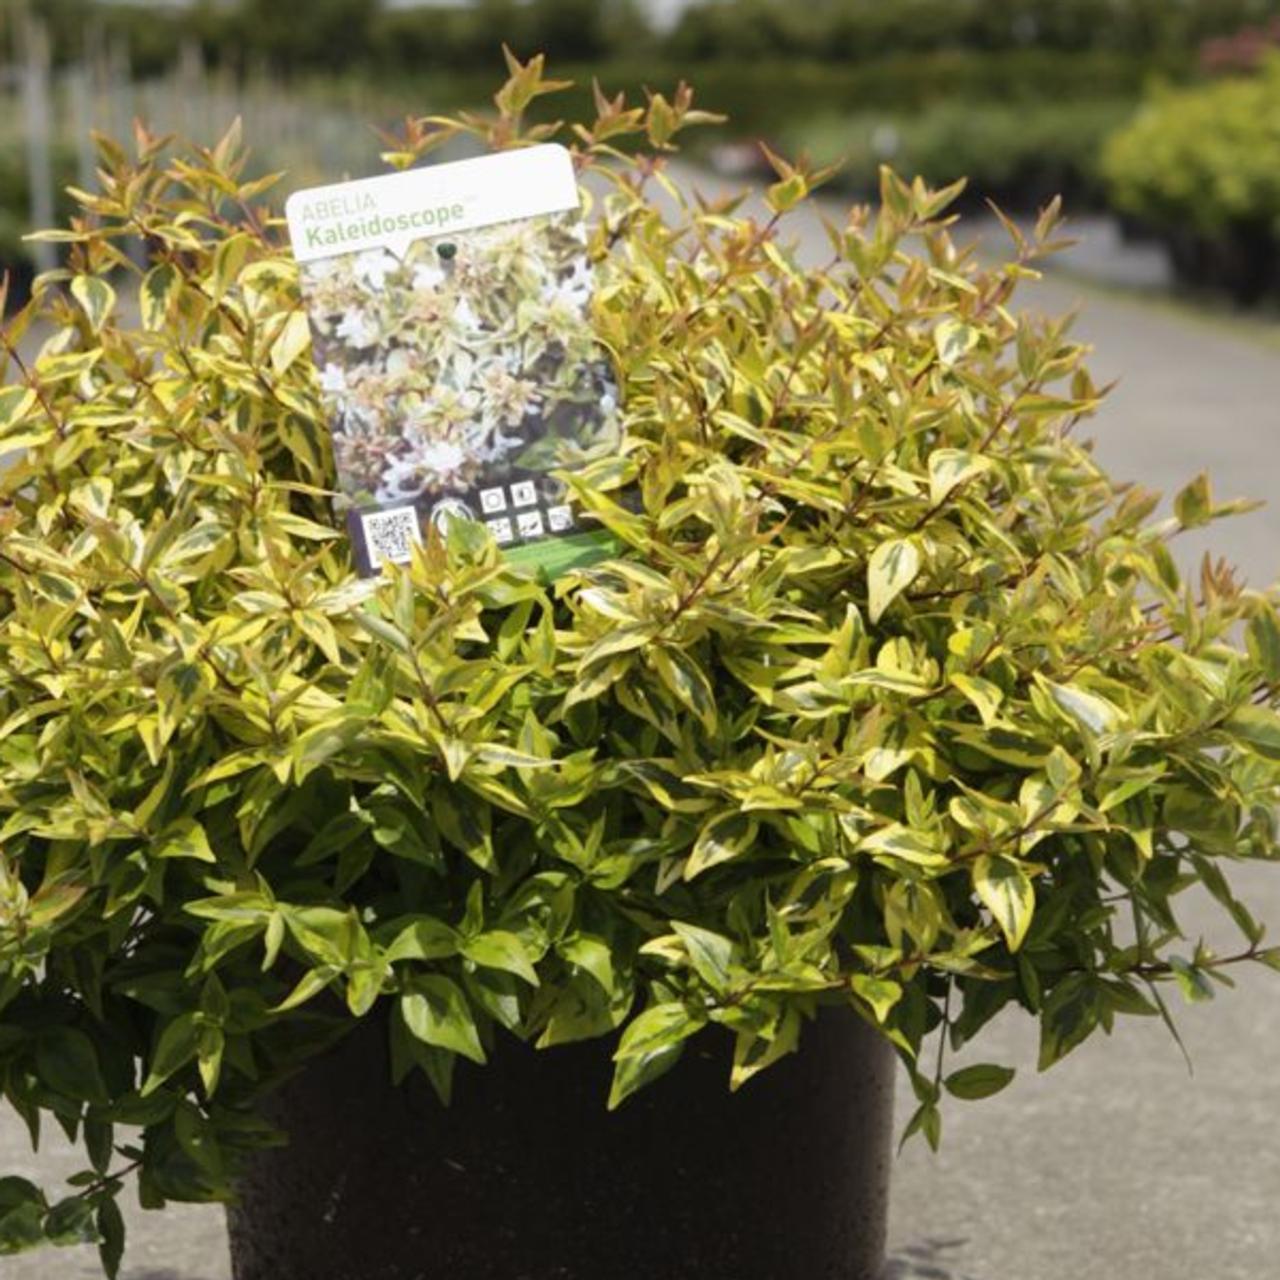 Abelia 'Kaleidoscope' plant